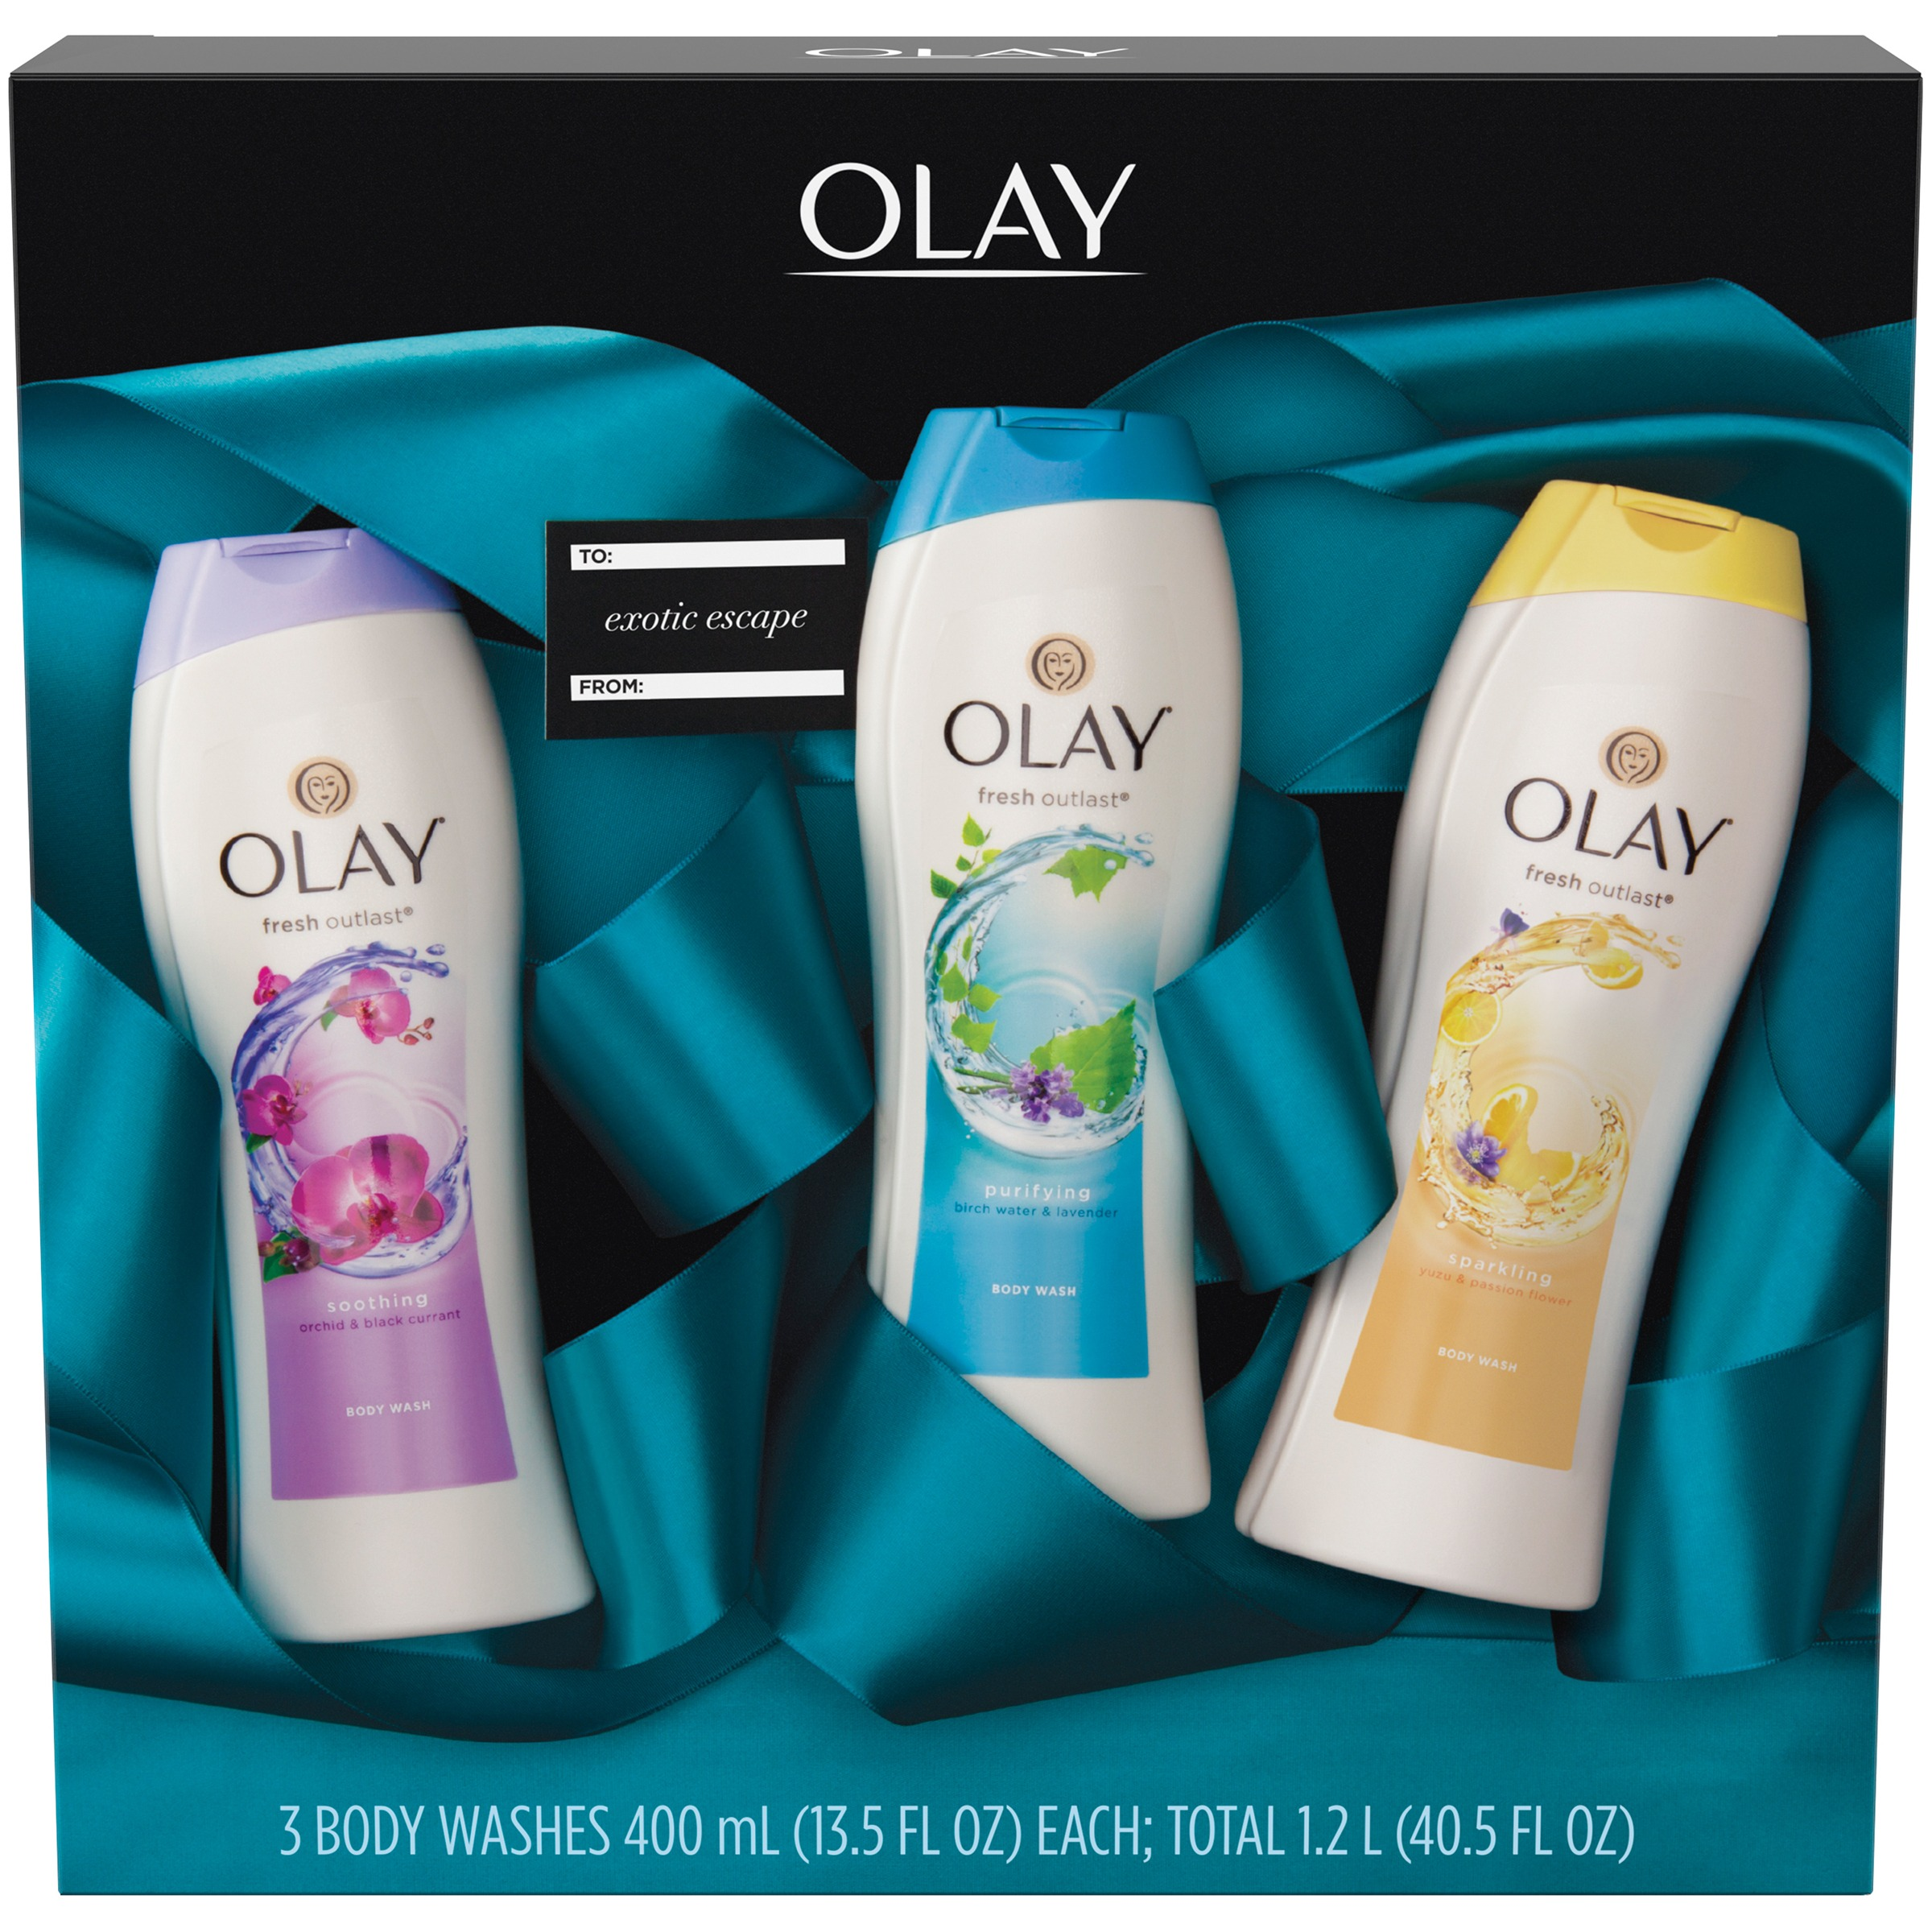 Olay® Fresh Outlast® Exotic Escape Body Wash Gift Pack 3 - 13.5 fl oz Box